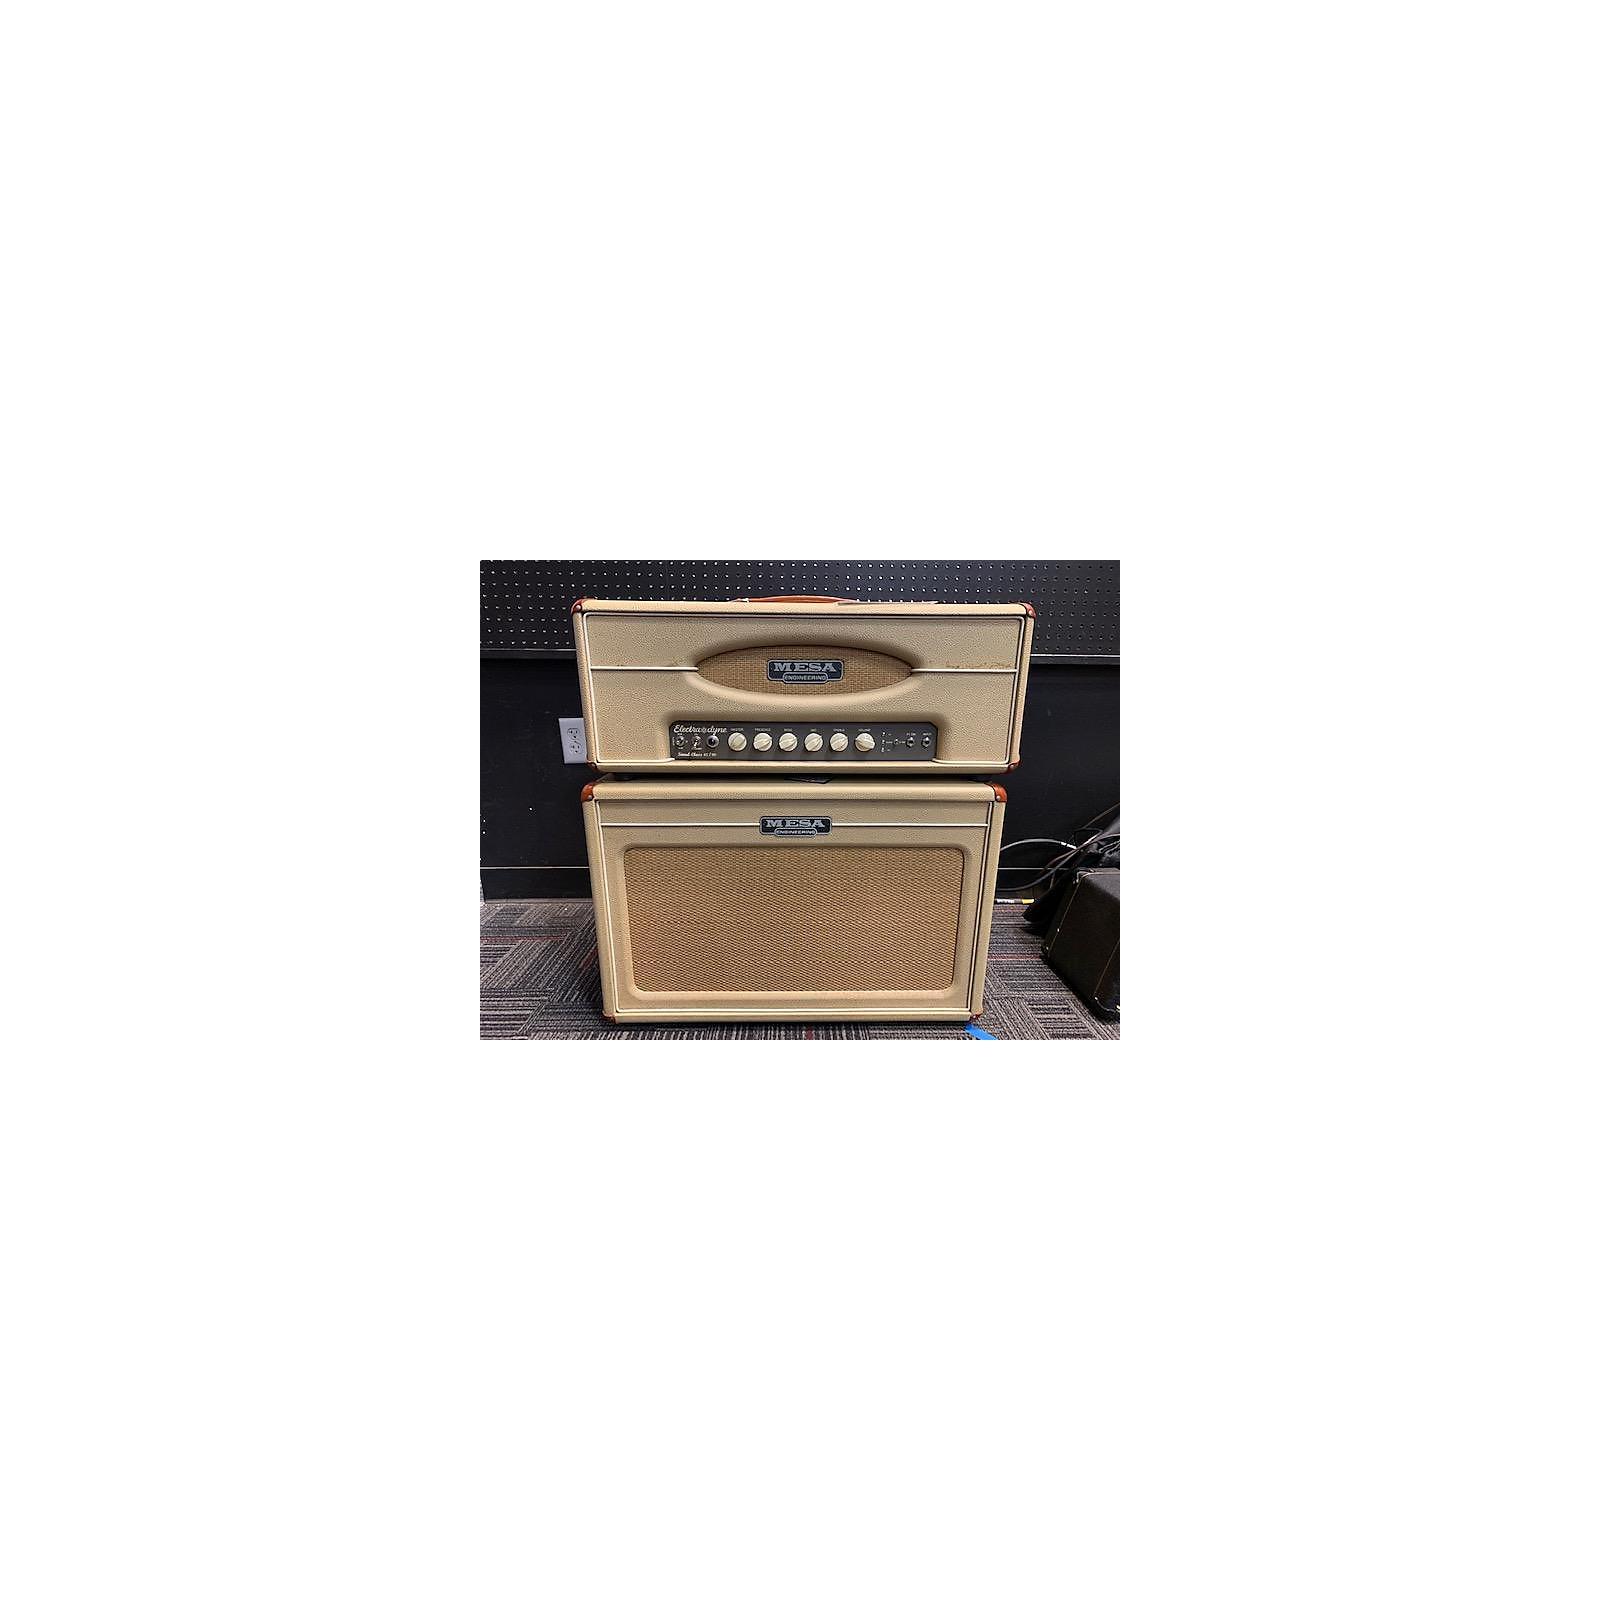 Mesa Boogie Electra Dyne 45/90 Half Stack Tube Guitar Amp Head